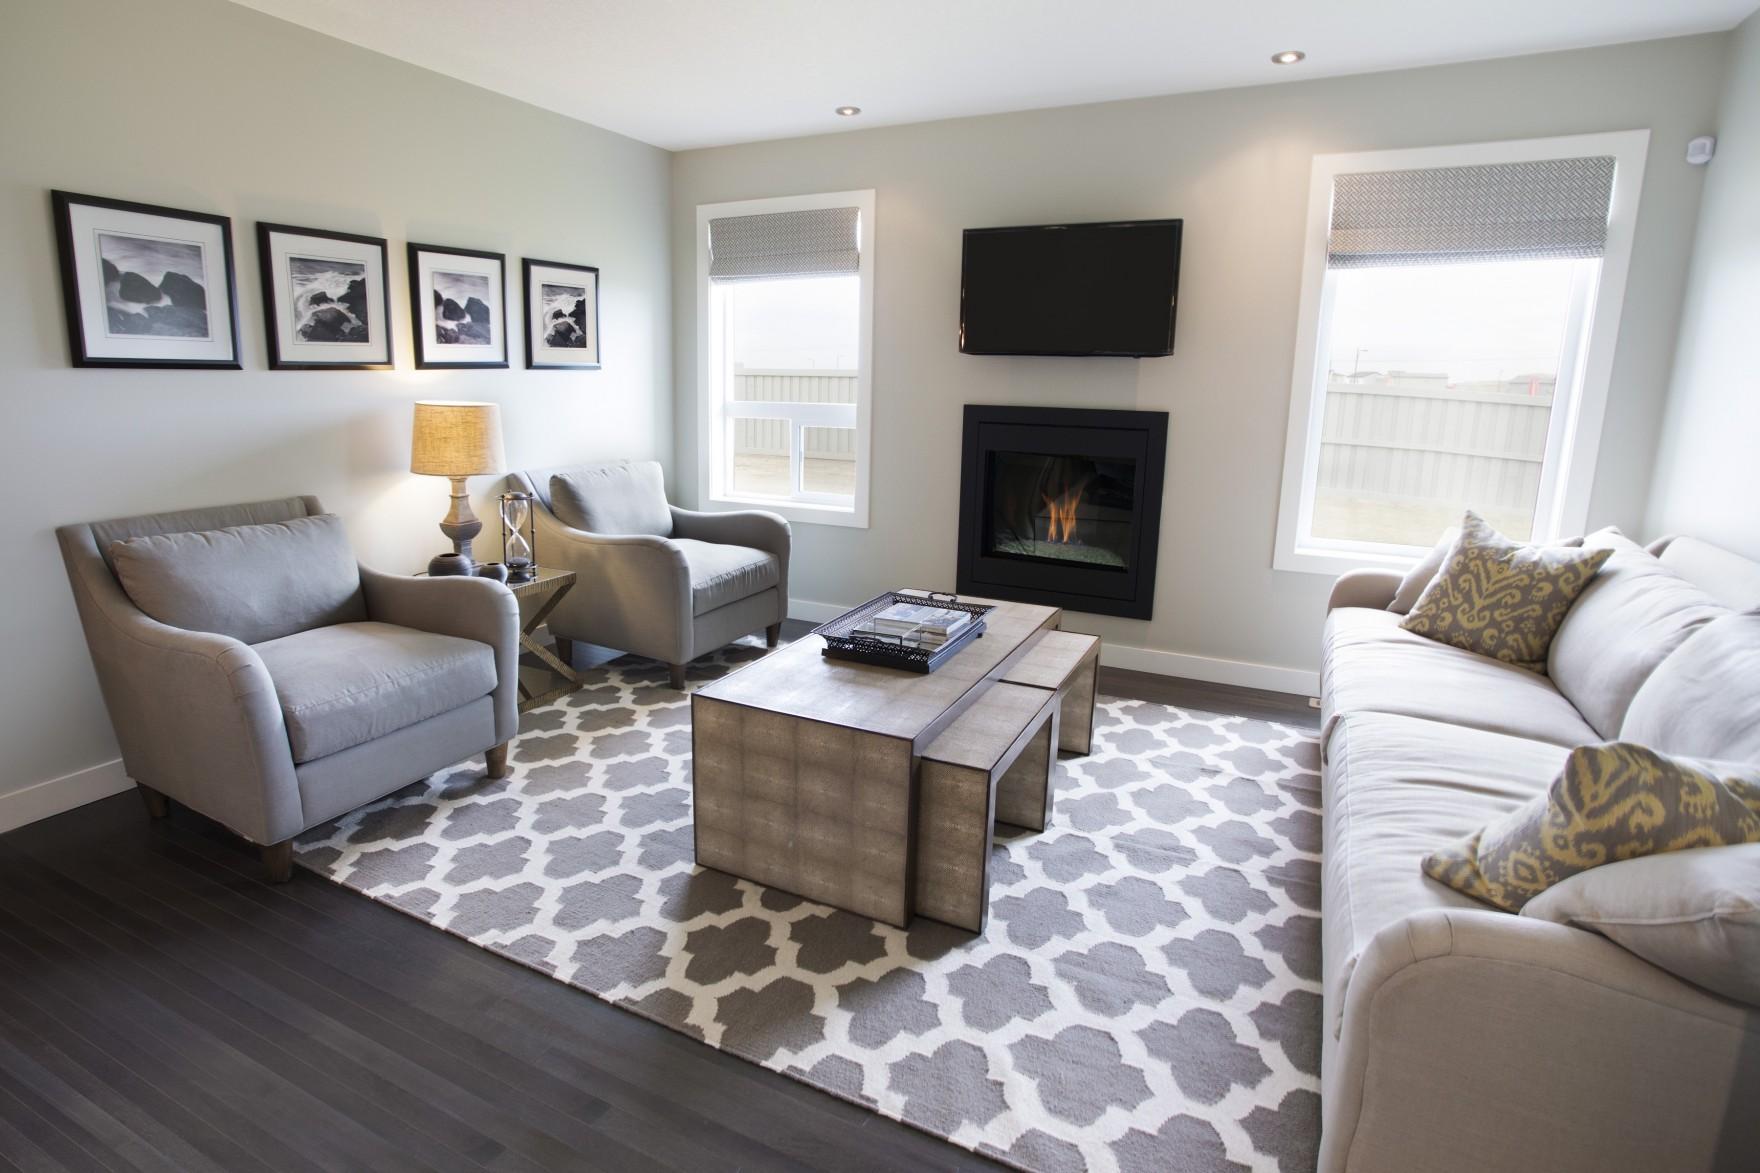 Edmonton Home And Interior Design Show Best Accessories Home 2017